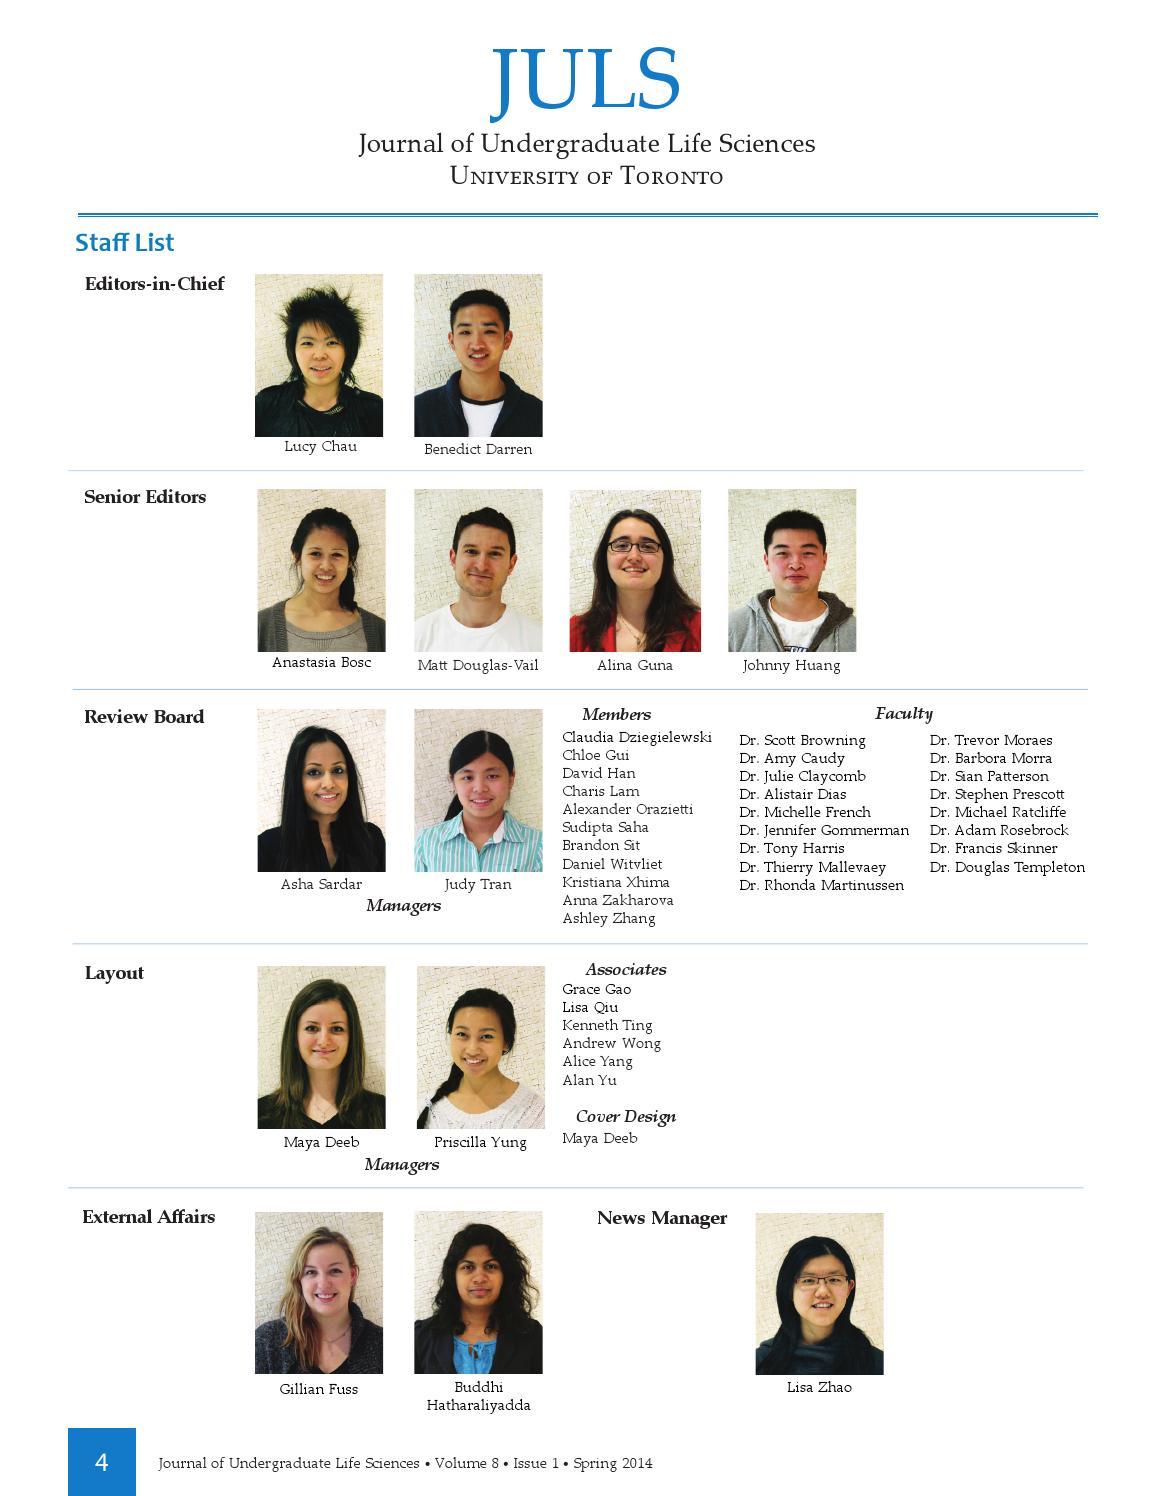 Journal of Undergraduate Life Sciences Volume 8 Issue 1 Spring 2014